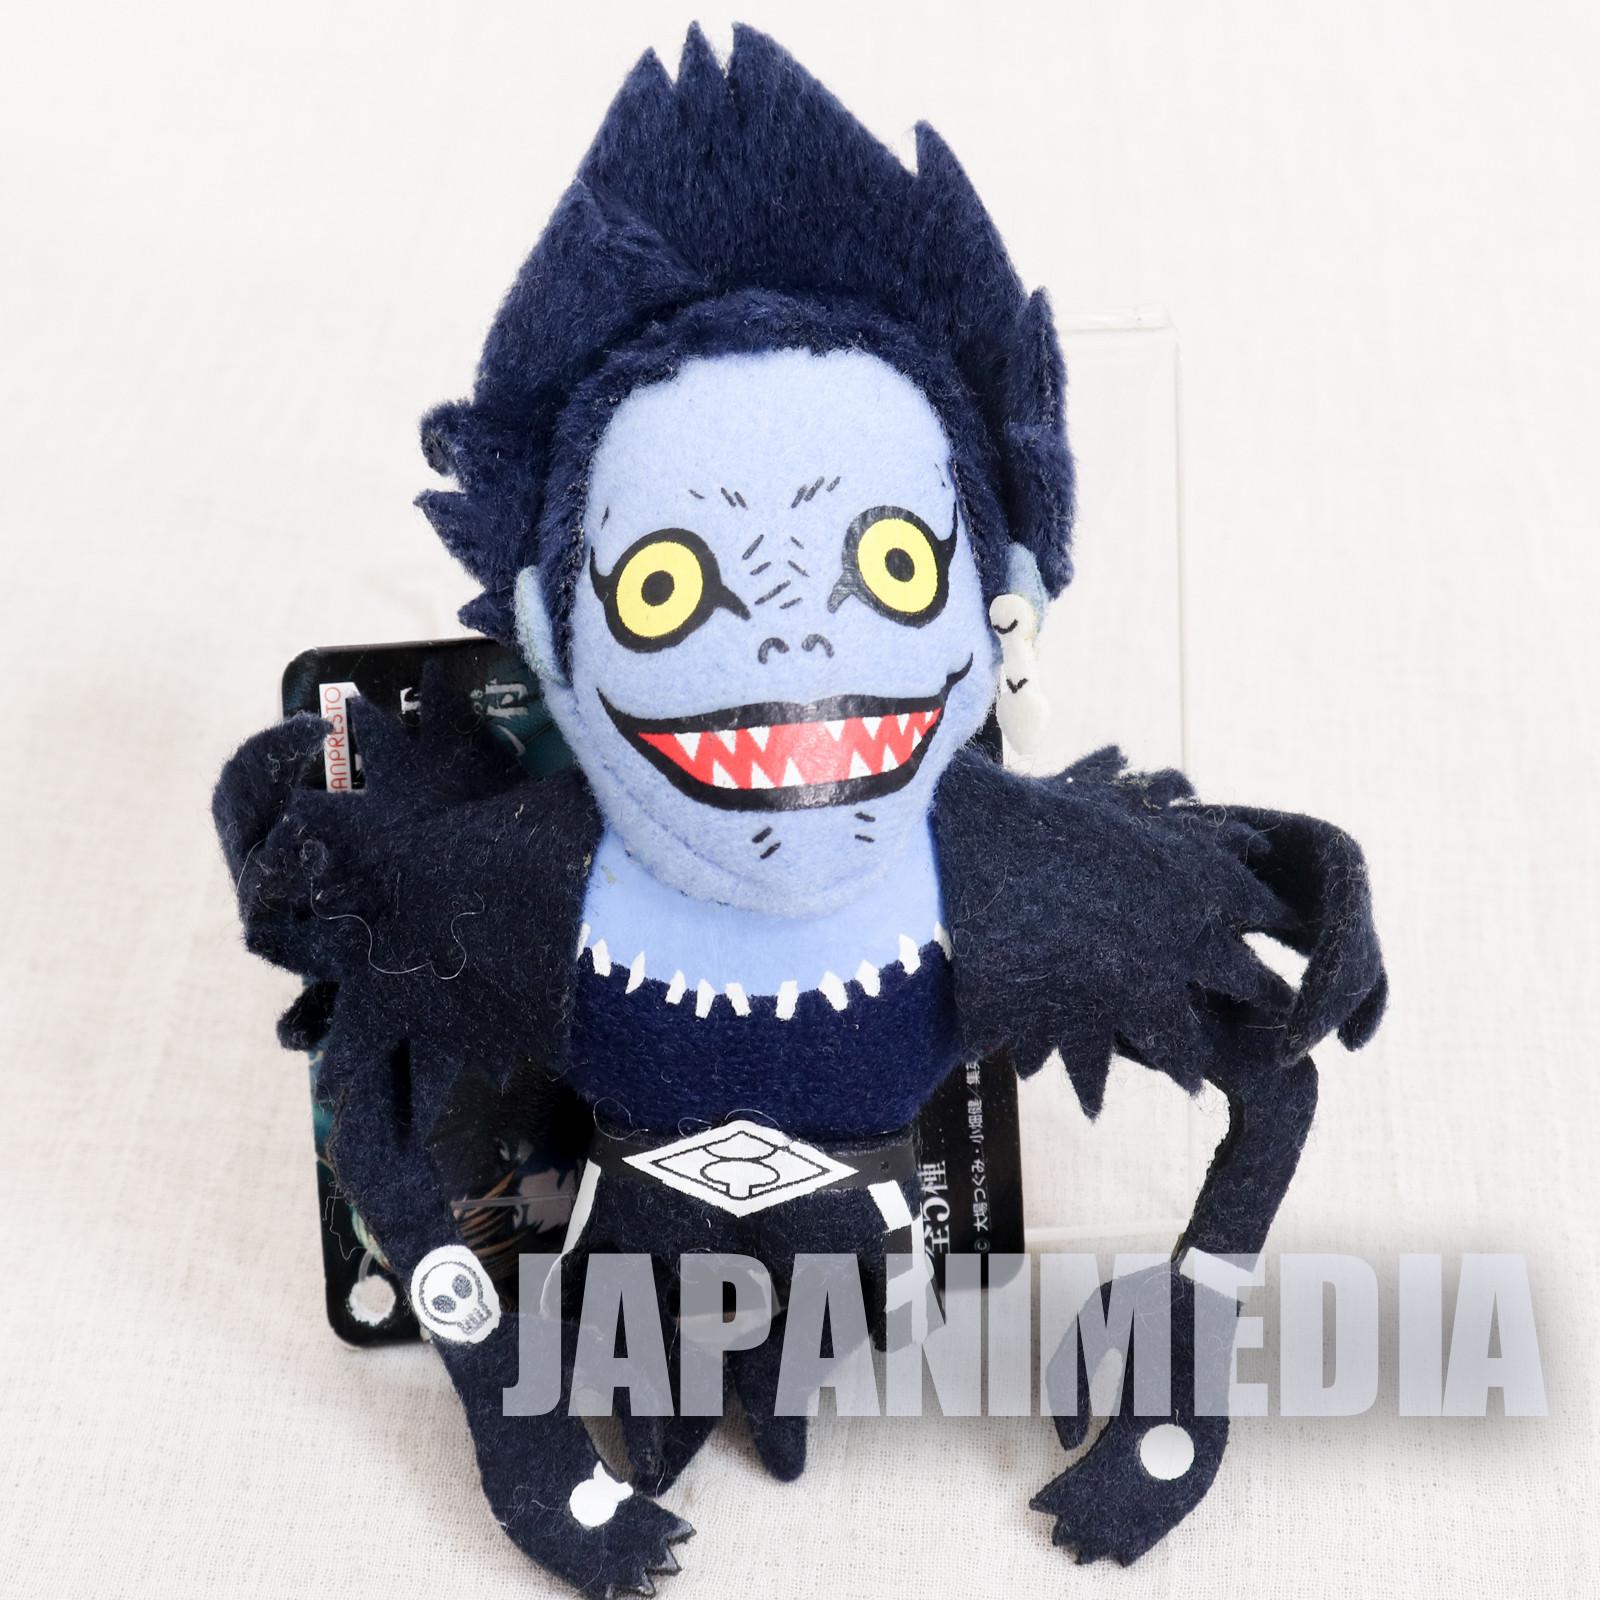 Death Note Ryuk Weekly Jump Plush doll Mascot Ballchain JAPAN